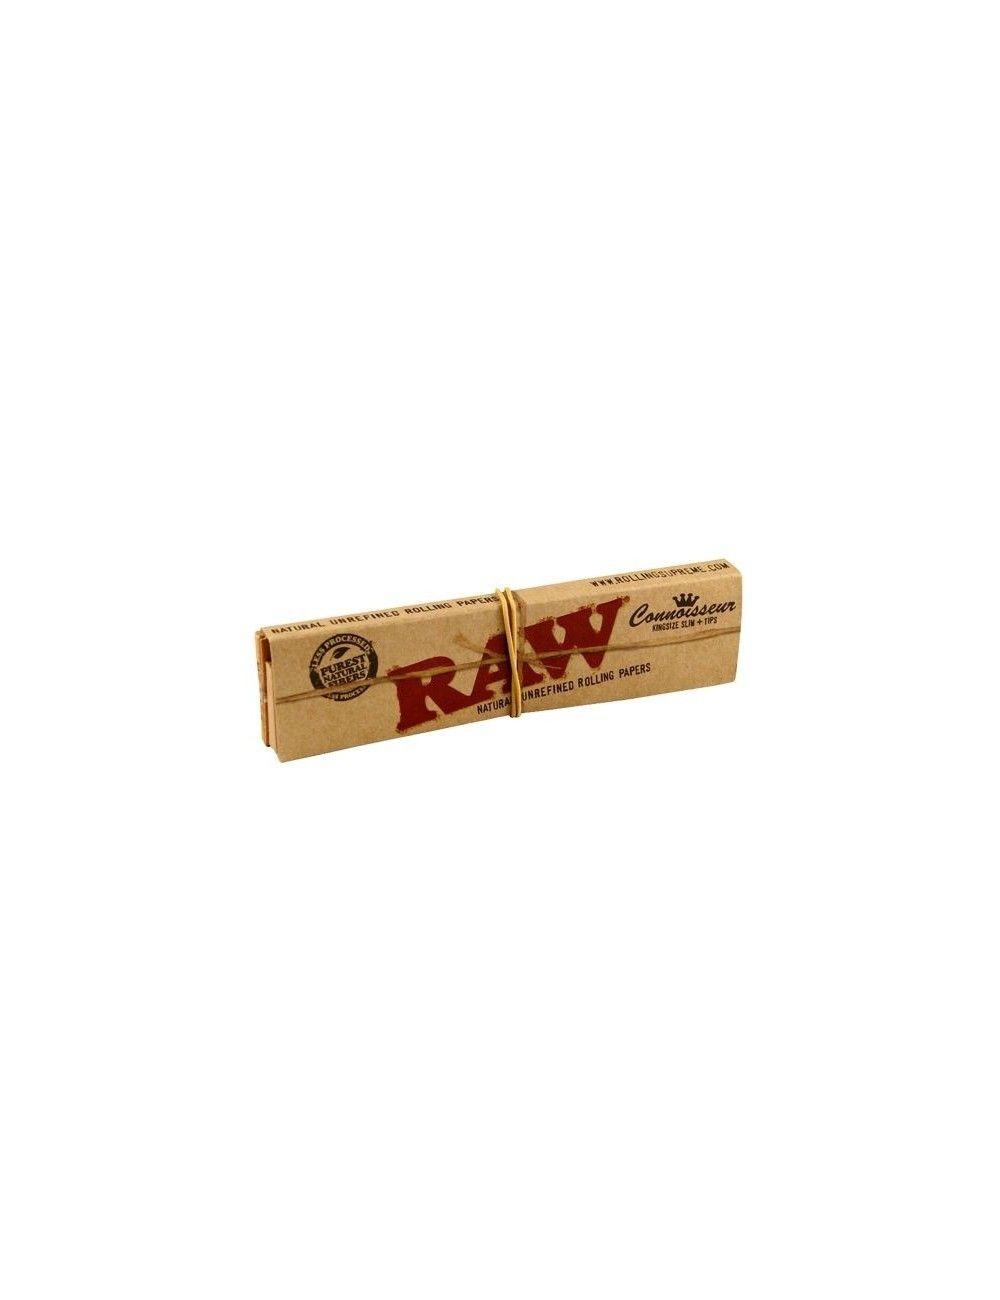 RAW Connoisseur KS